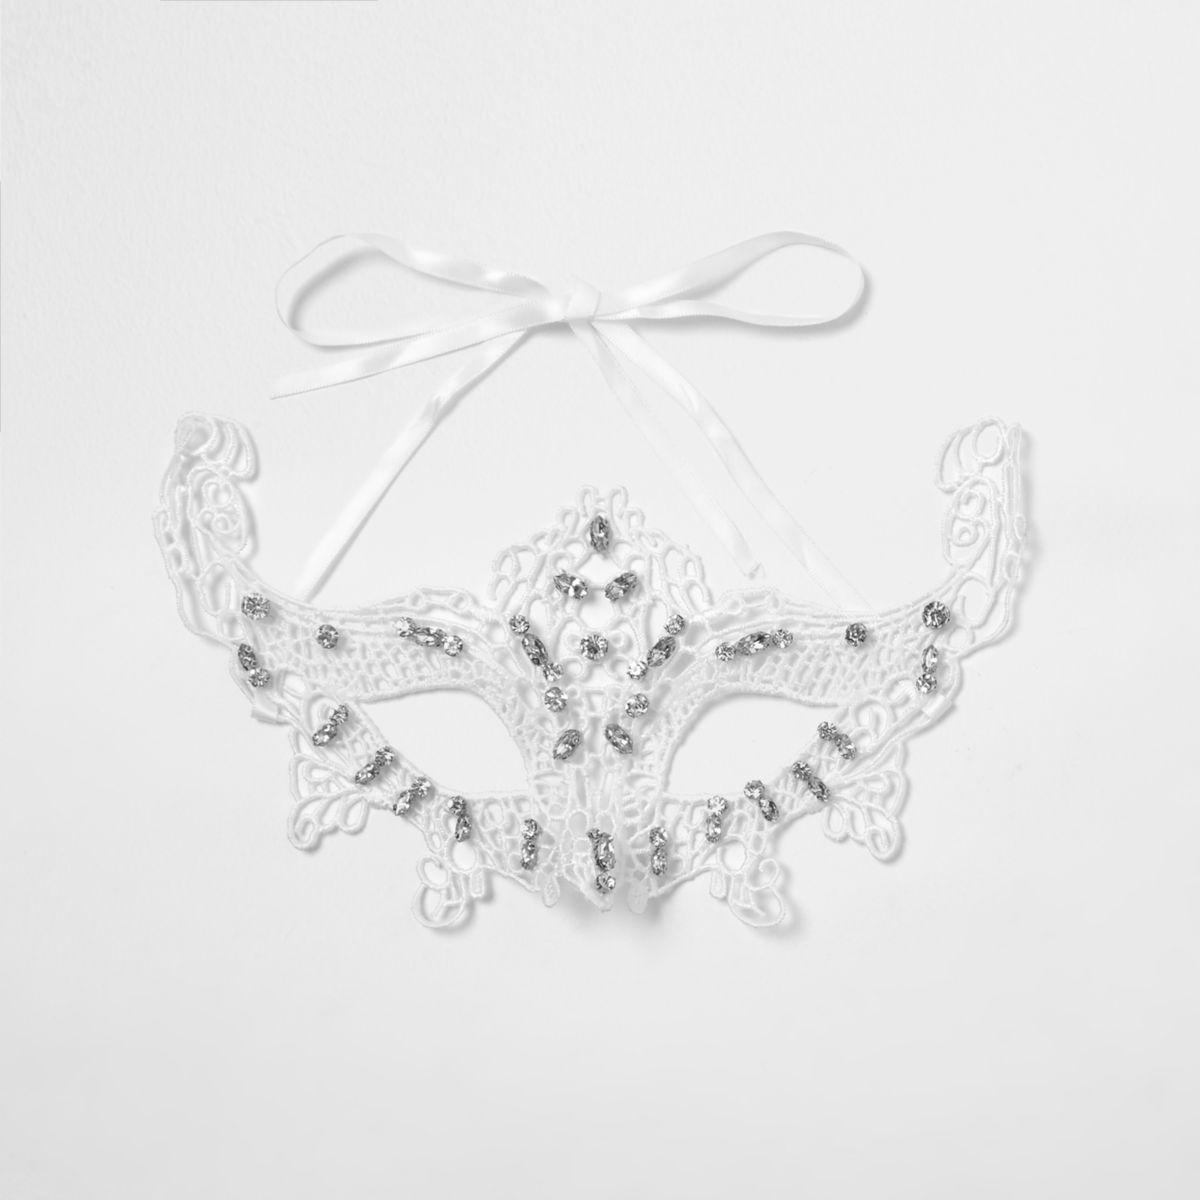 White lace diamante encrusted eye mask